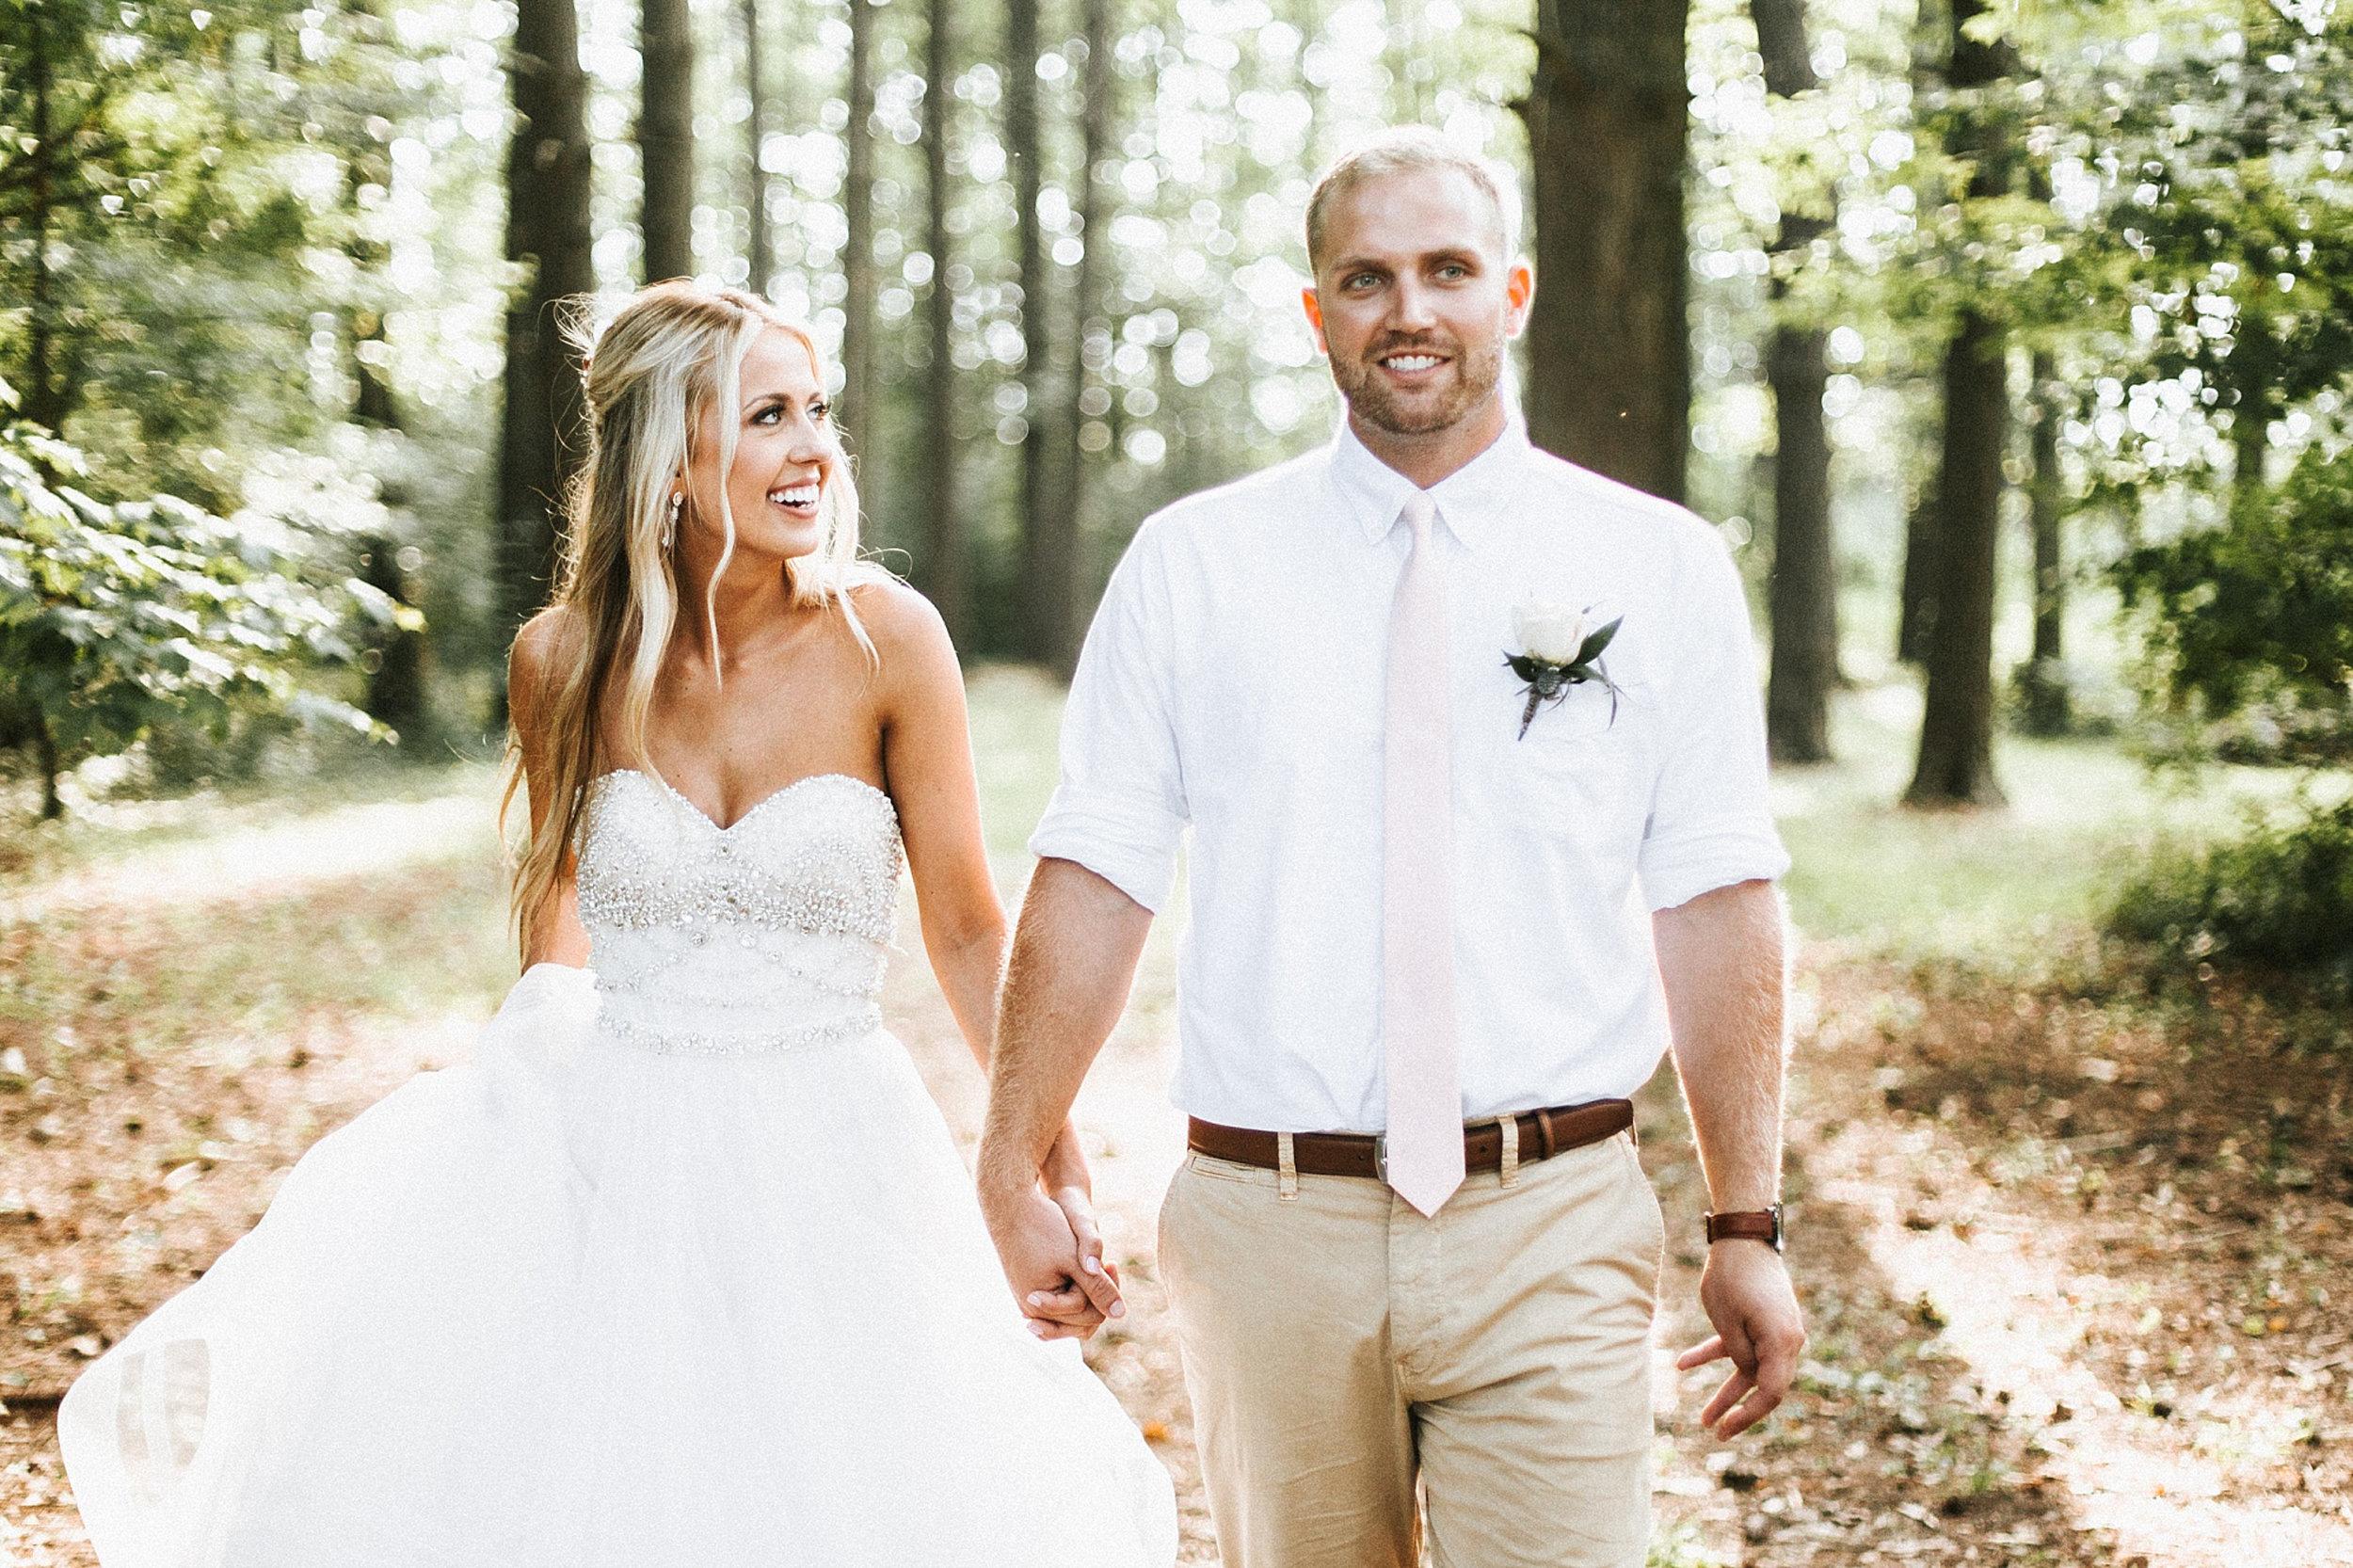 Brooke Townsend Photography - Cincinnati Wedding Photographer (119 of 153).jpg